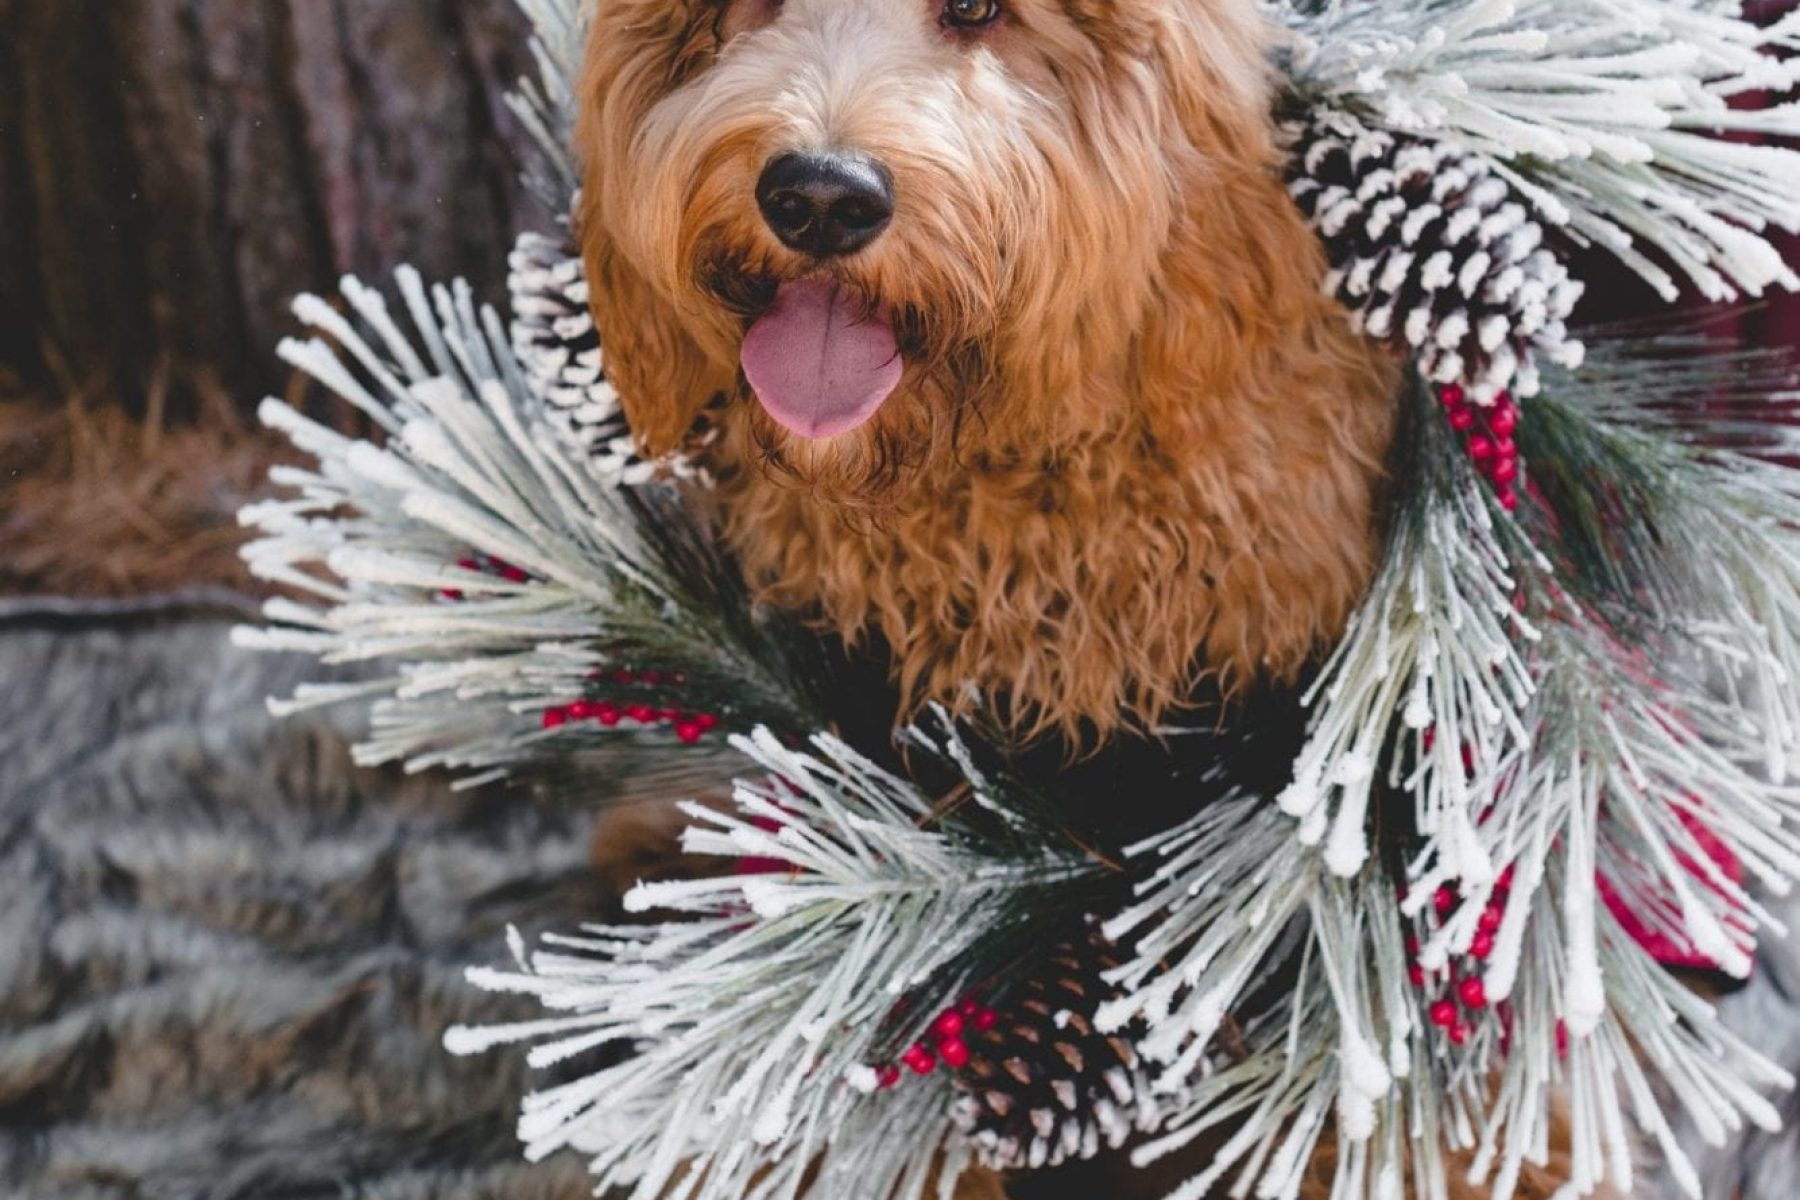 Dog-Goldendoodle-Holiday-Christmas